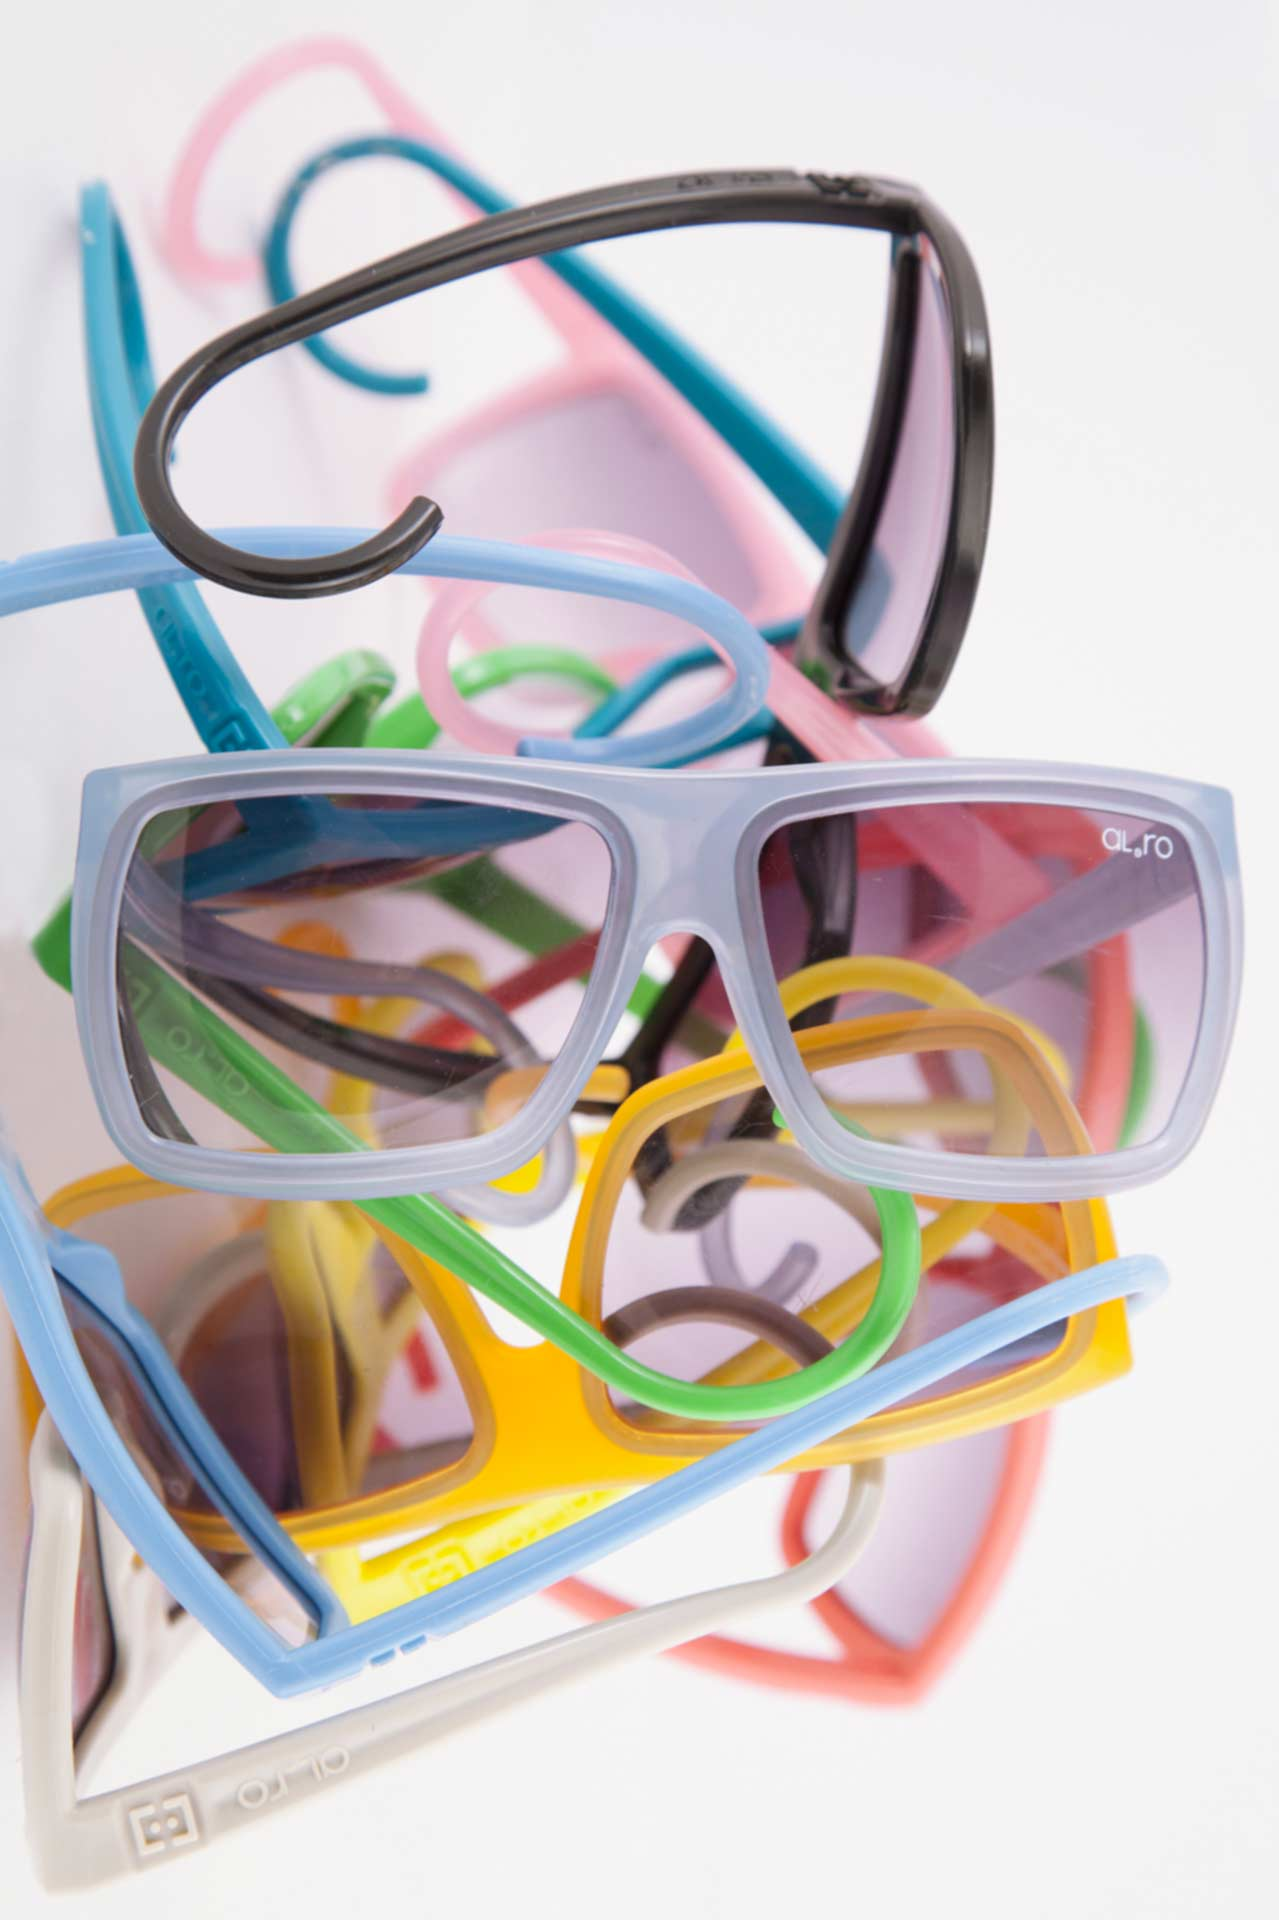 Al&Ro glasses